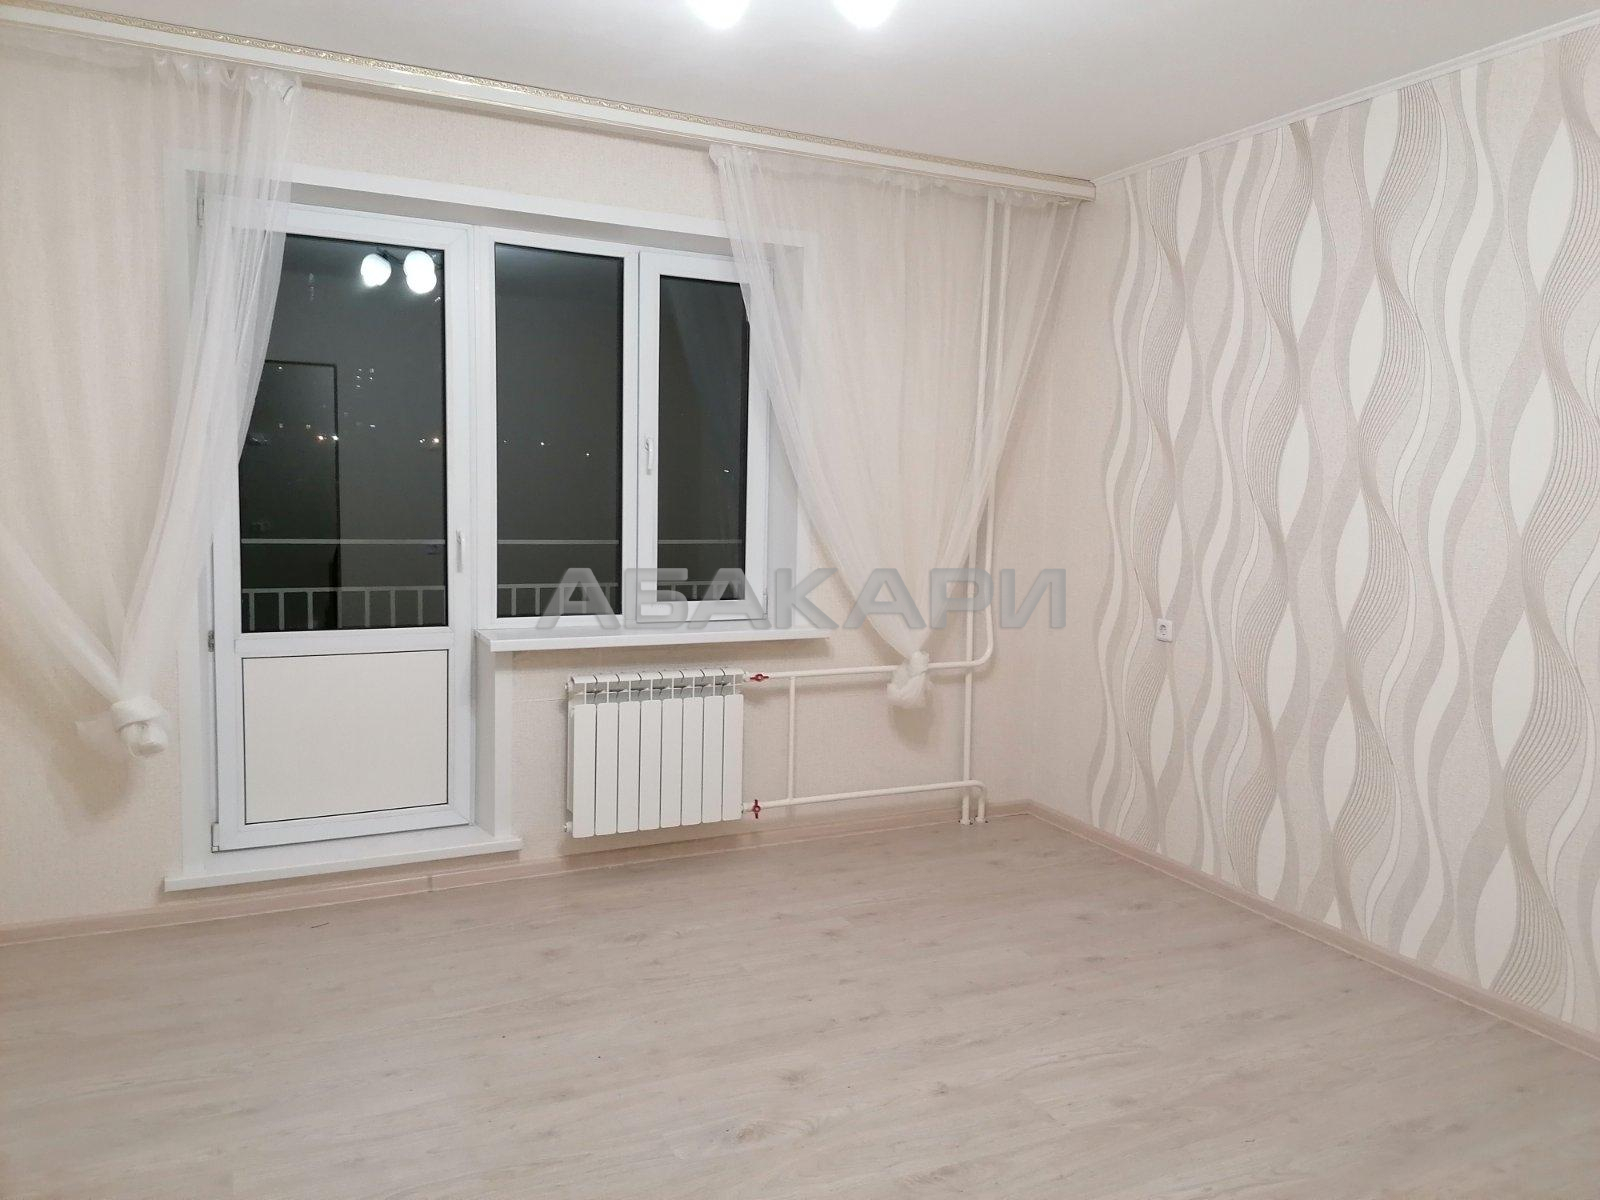 2к квартира Пролетарская улица, 147   15000   аренда в Красноярске фото 1